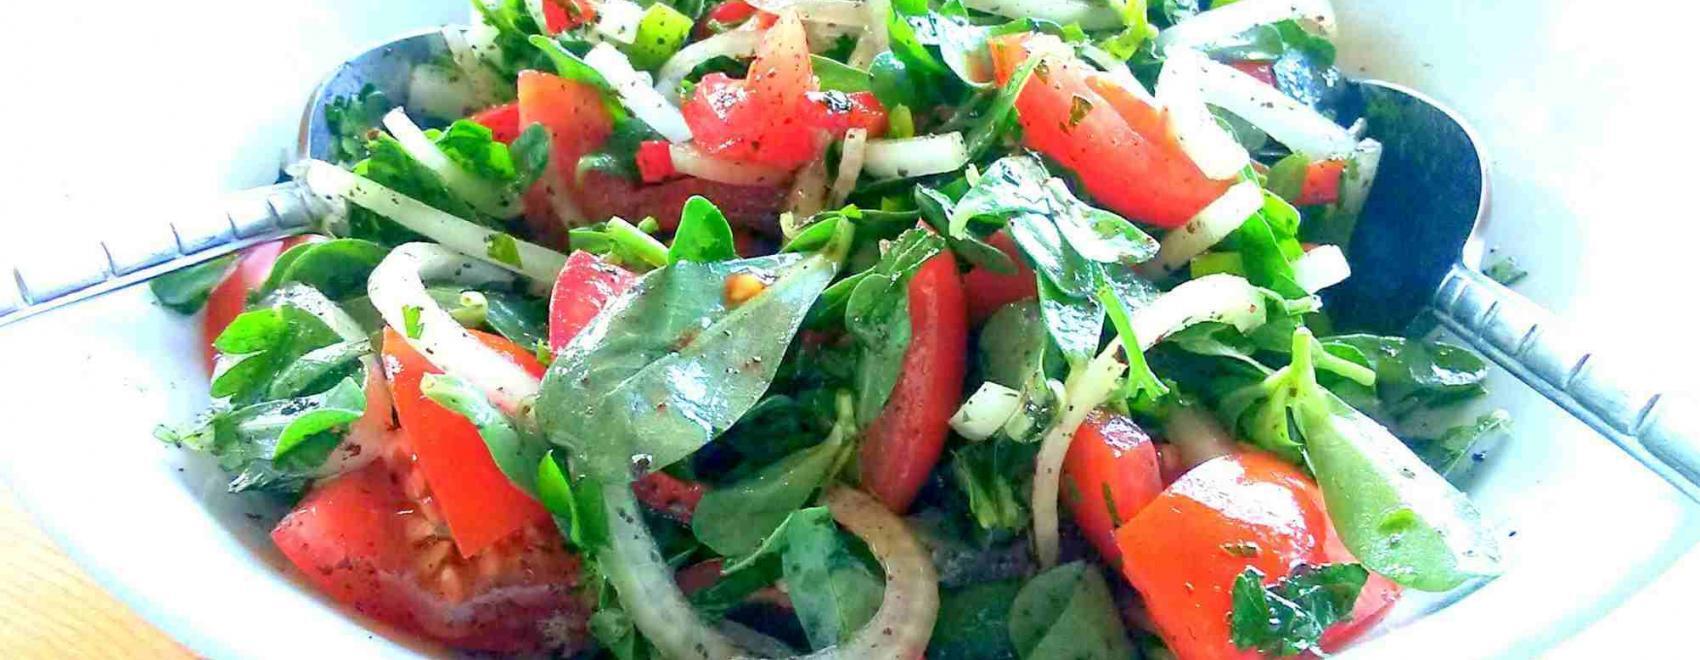 Turkish Purslane And Tomato Salad